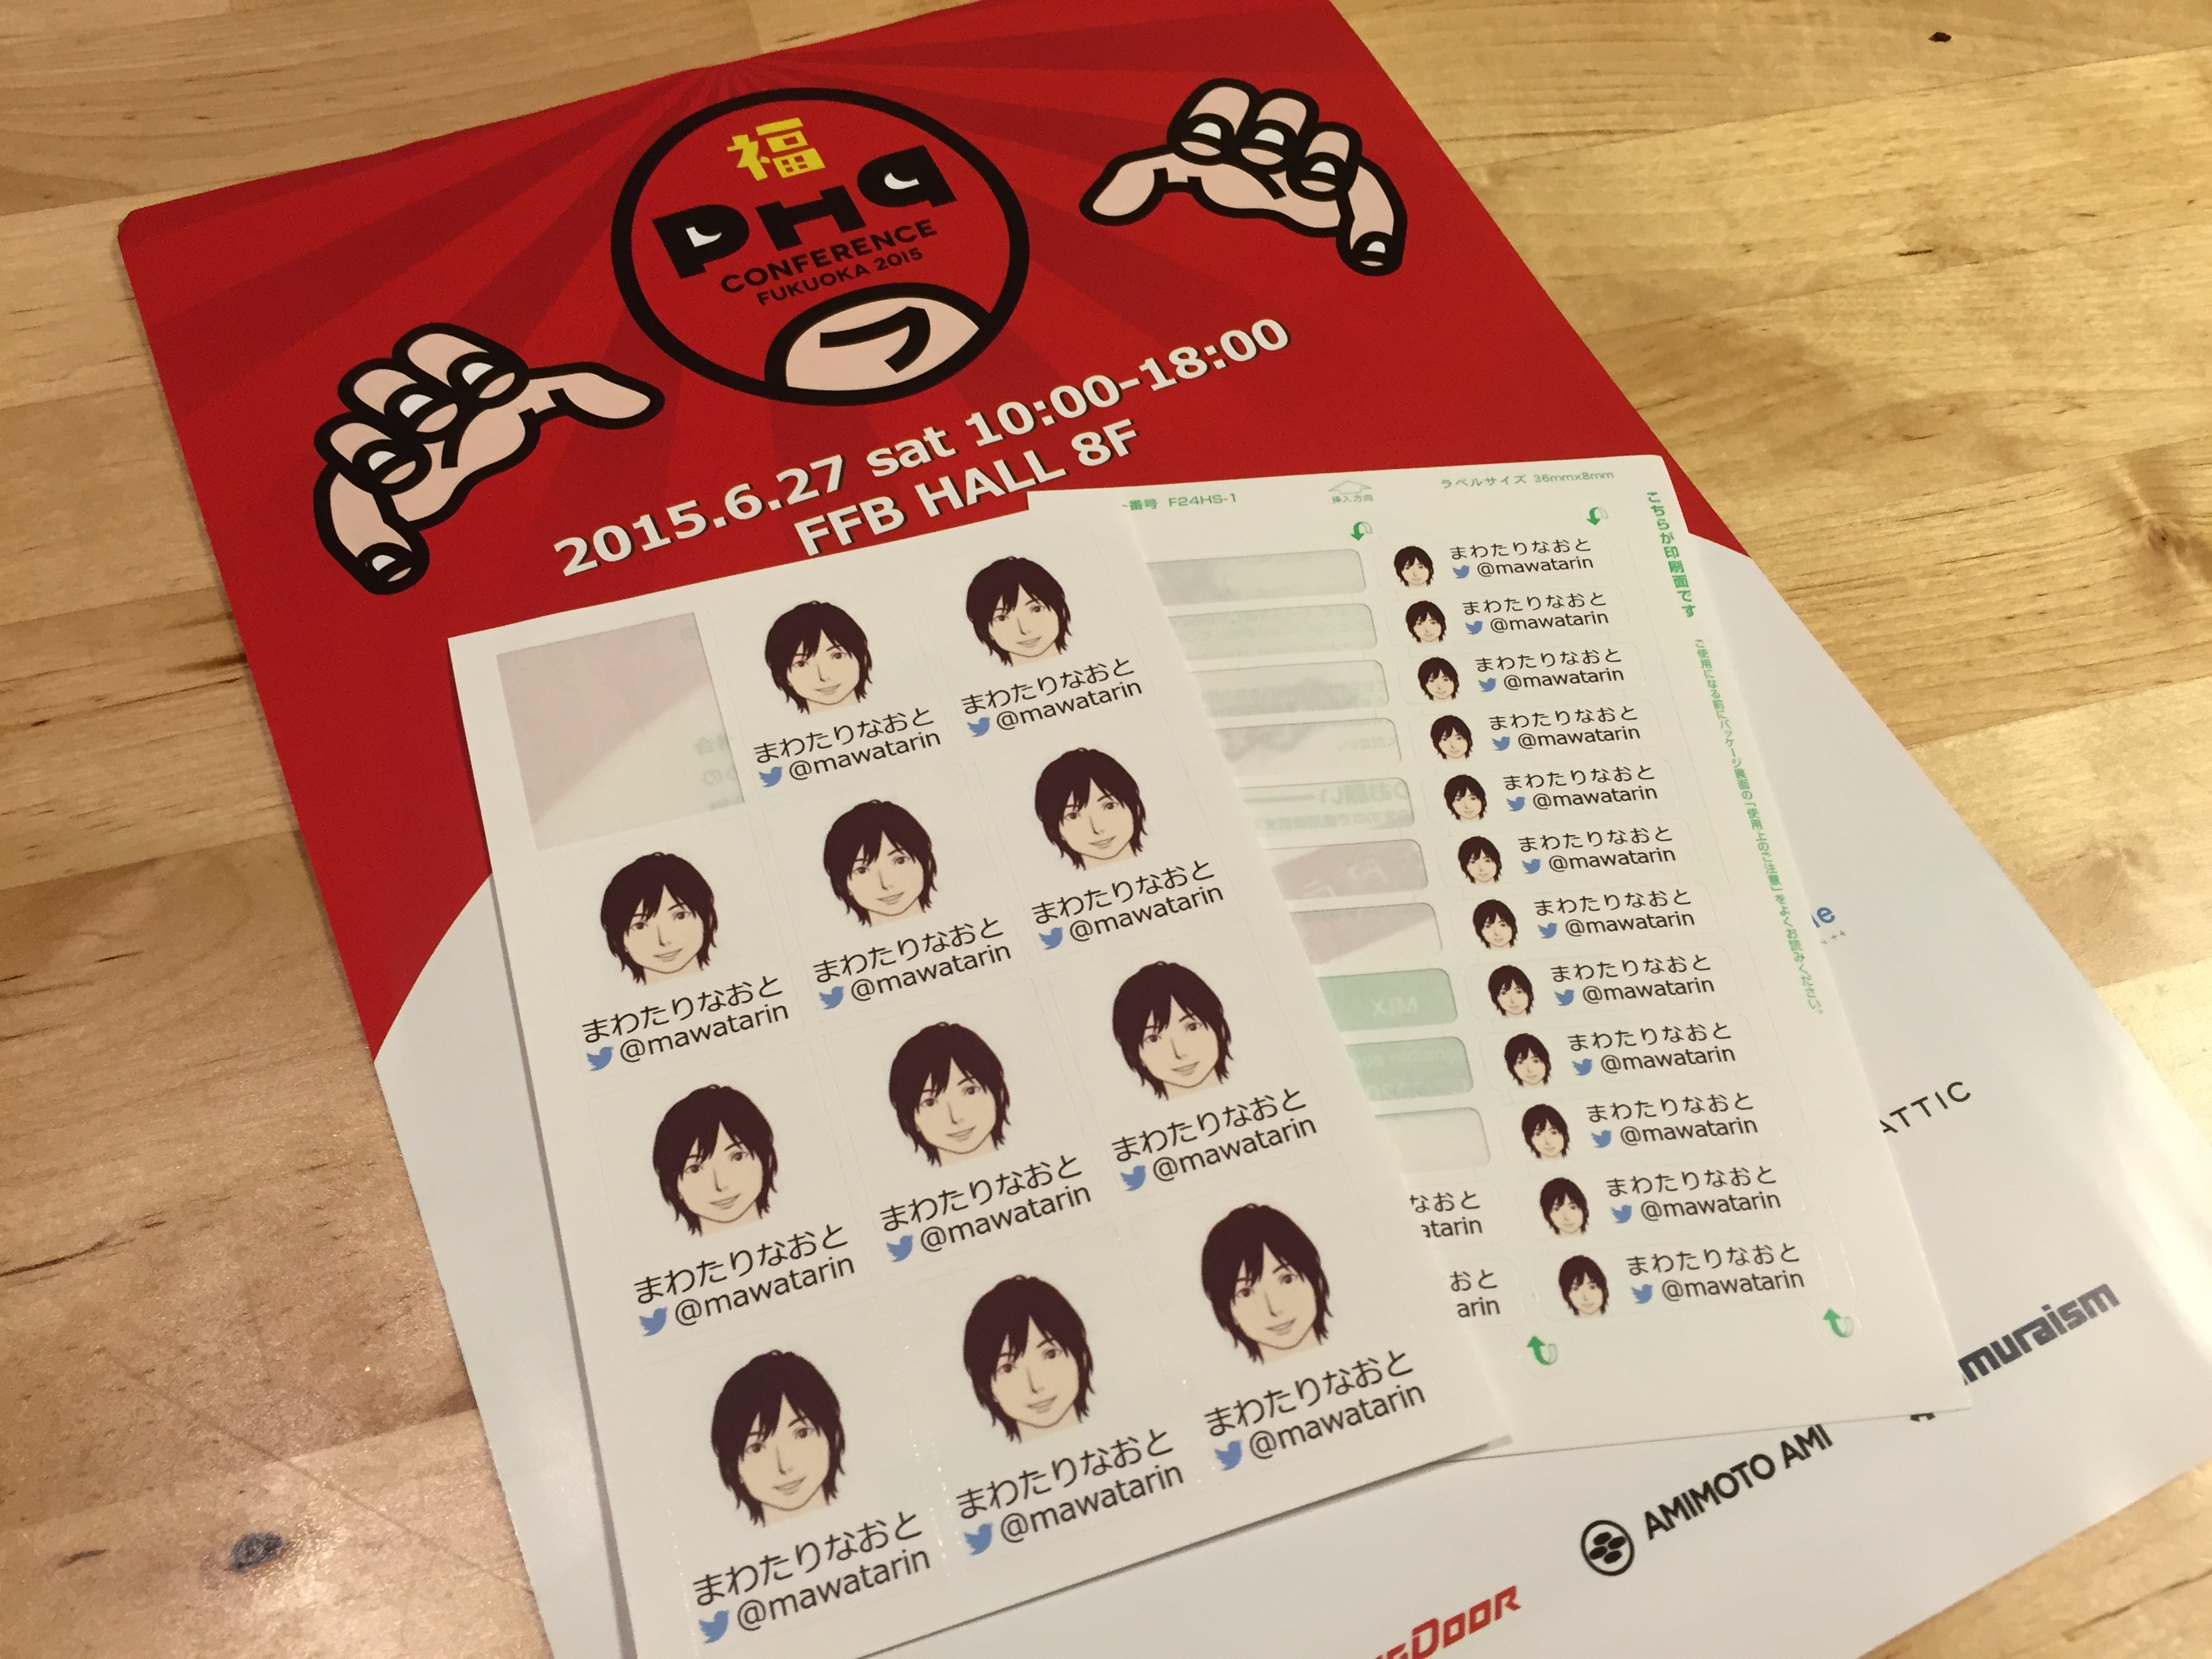 phpconference-fukuoka-2015-report-01